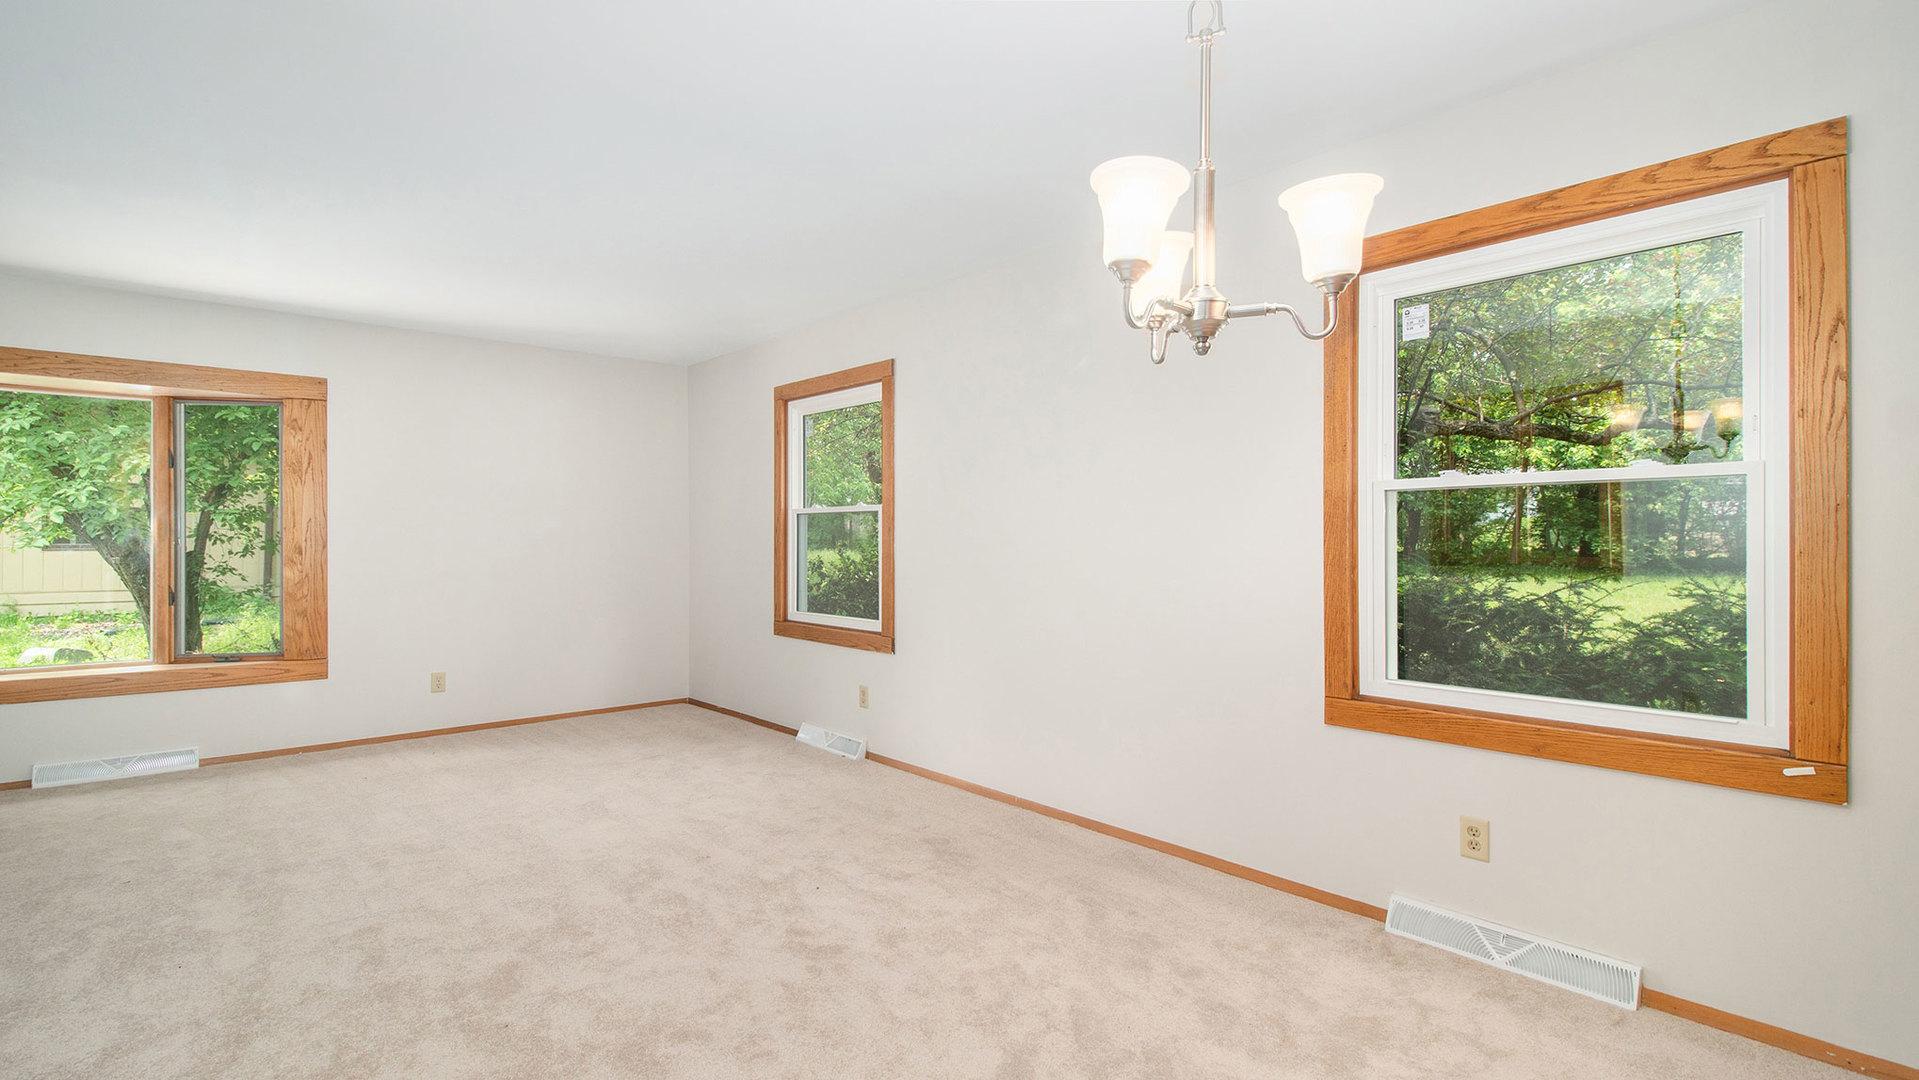 43W830 Oakleaf, ELBURN, Illinois, 60119